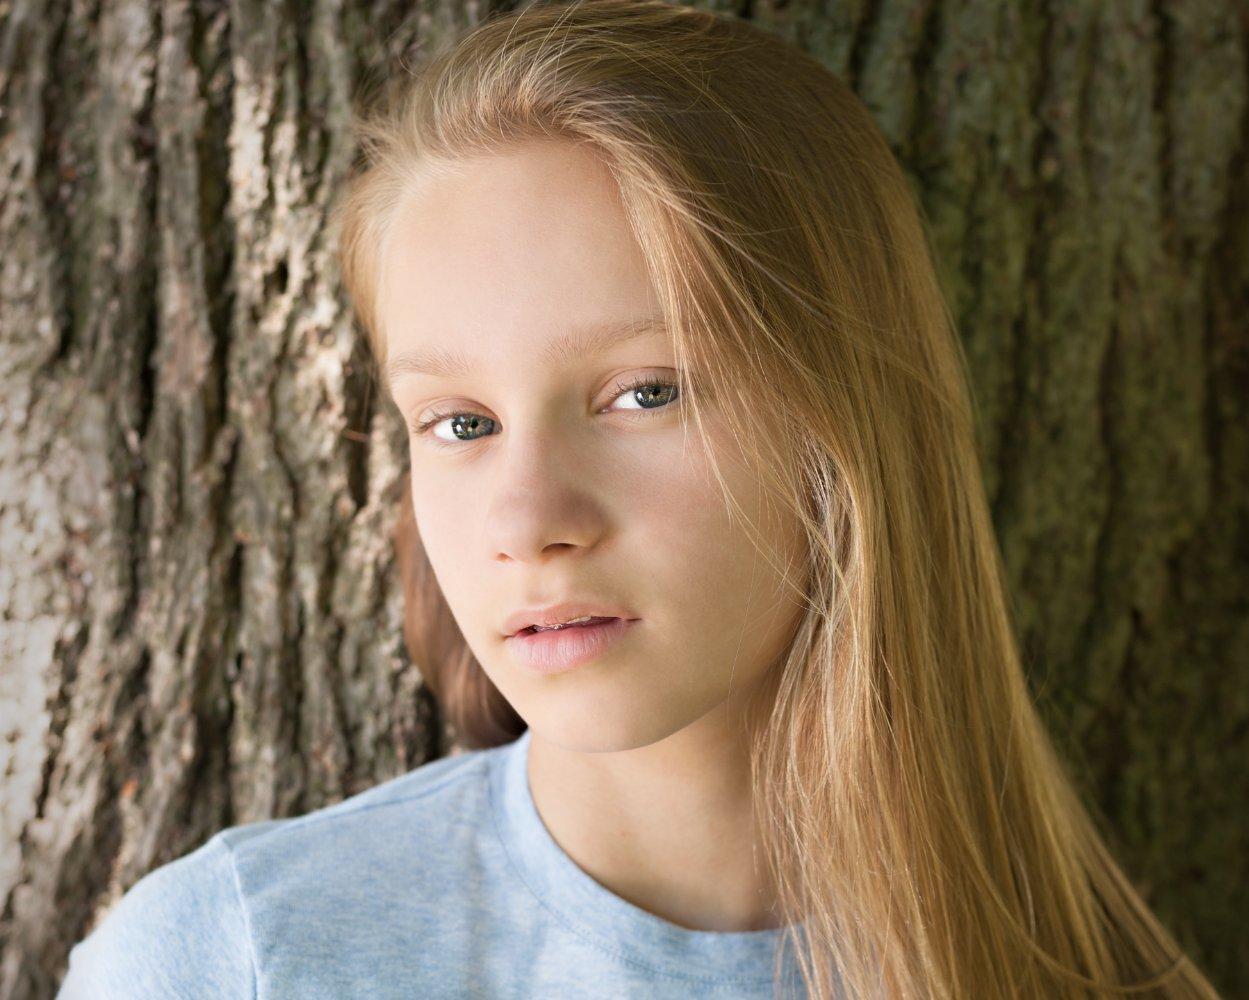 Hadley Delany